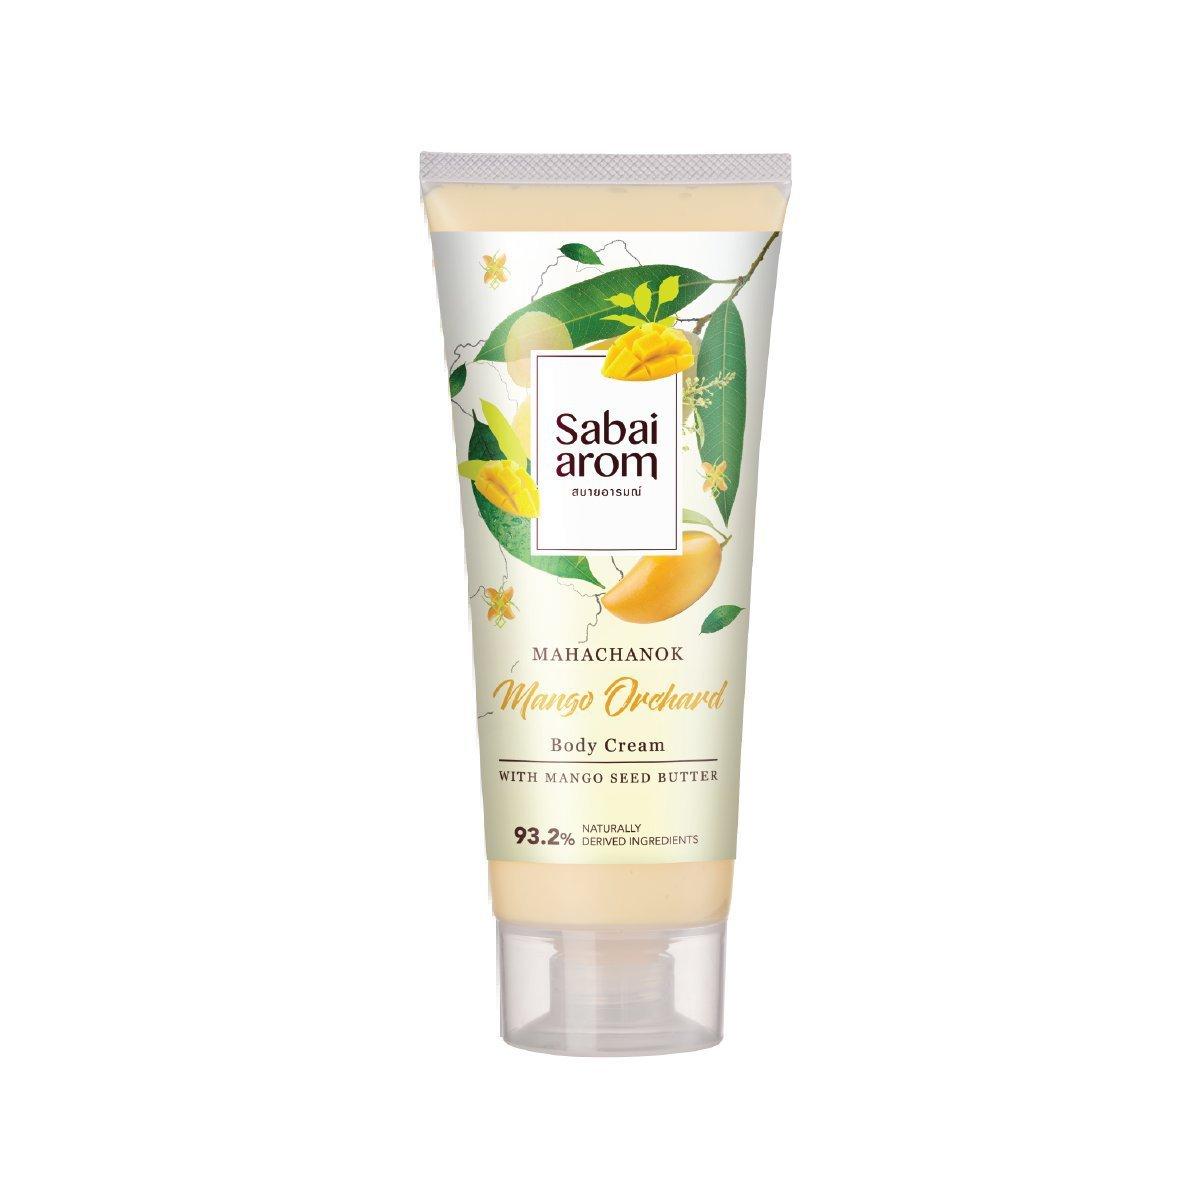 Sabai-arom Mango Orchard Body Cream 200 g. (2 Pack)